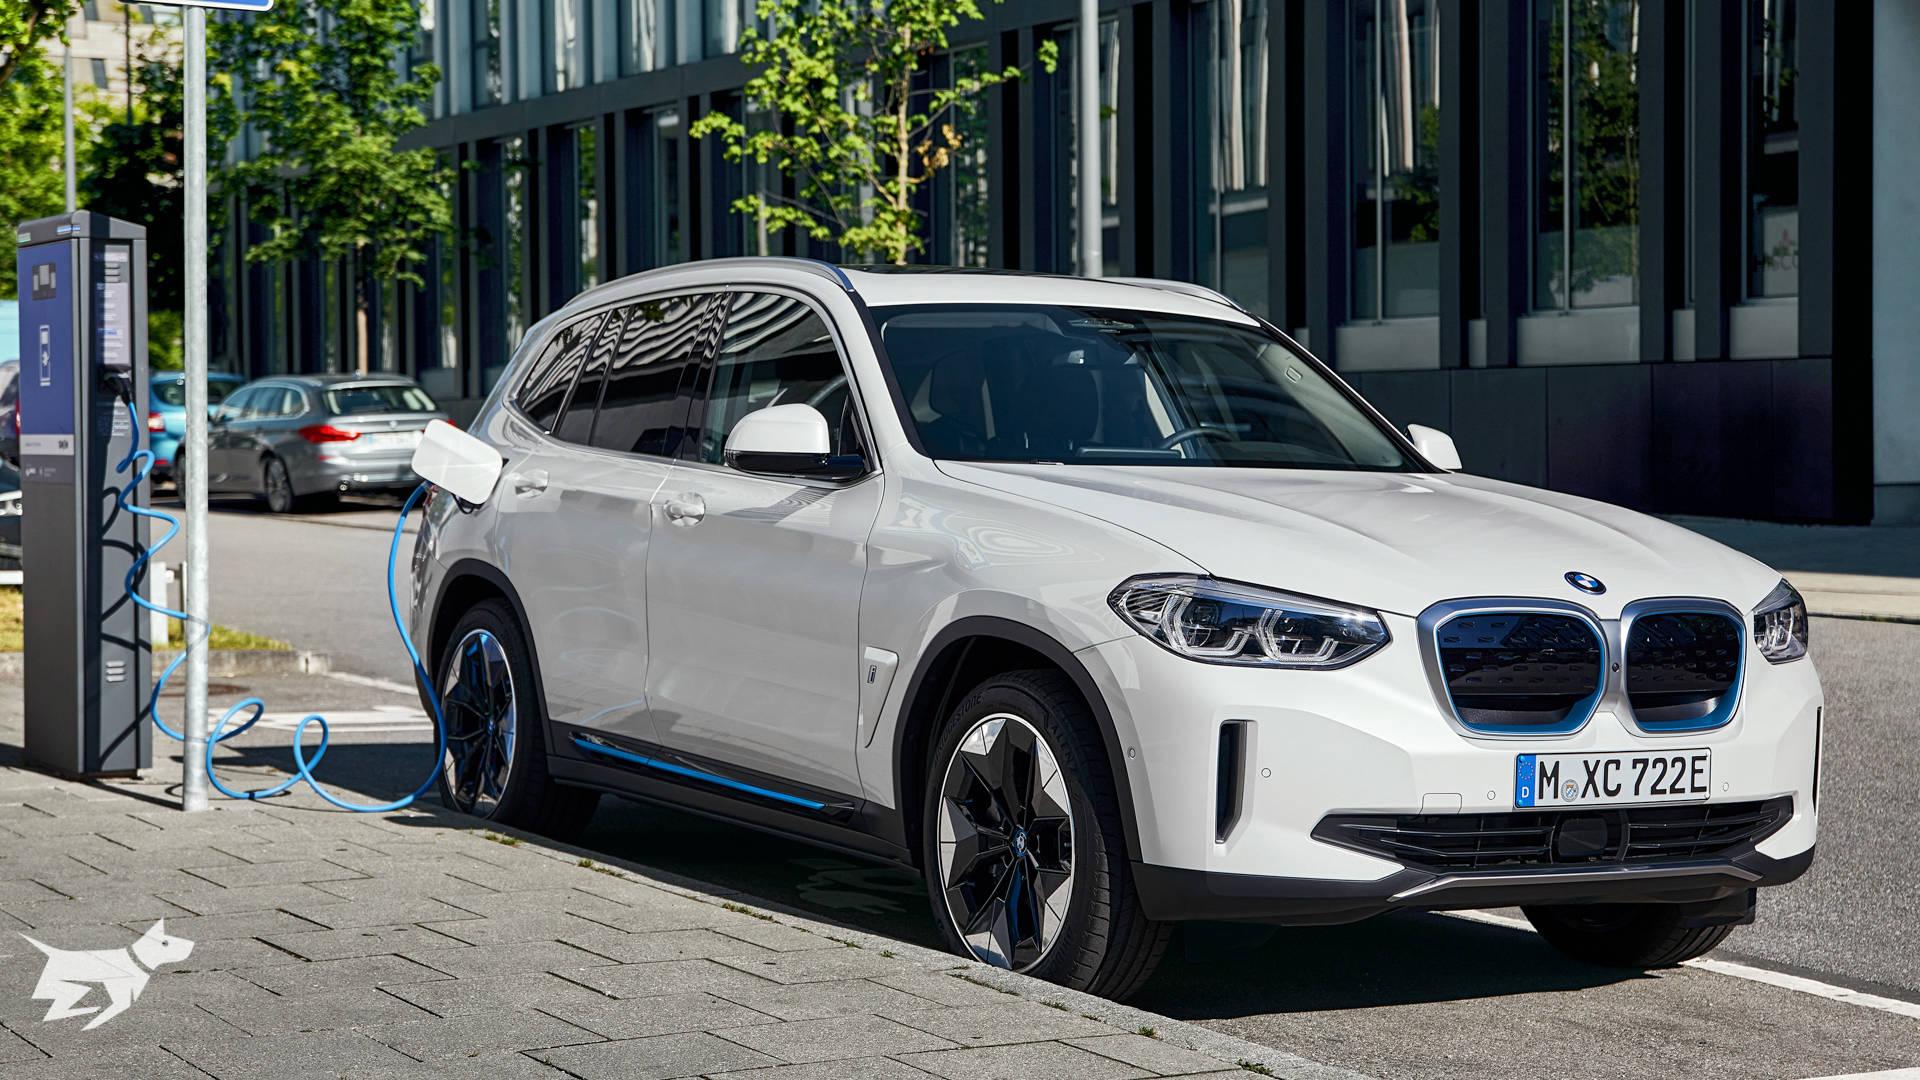 BMW iX3 electric SUV charging up